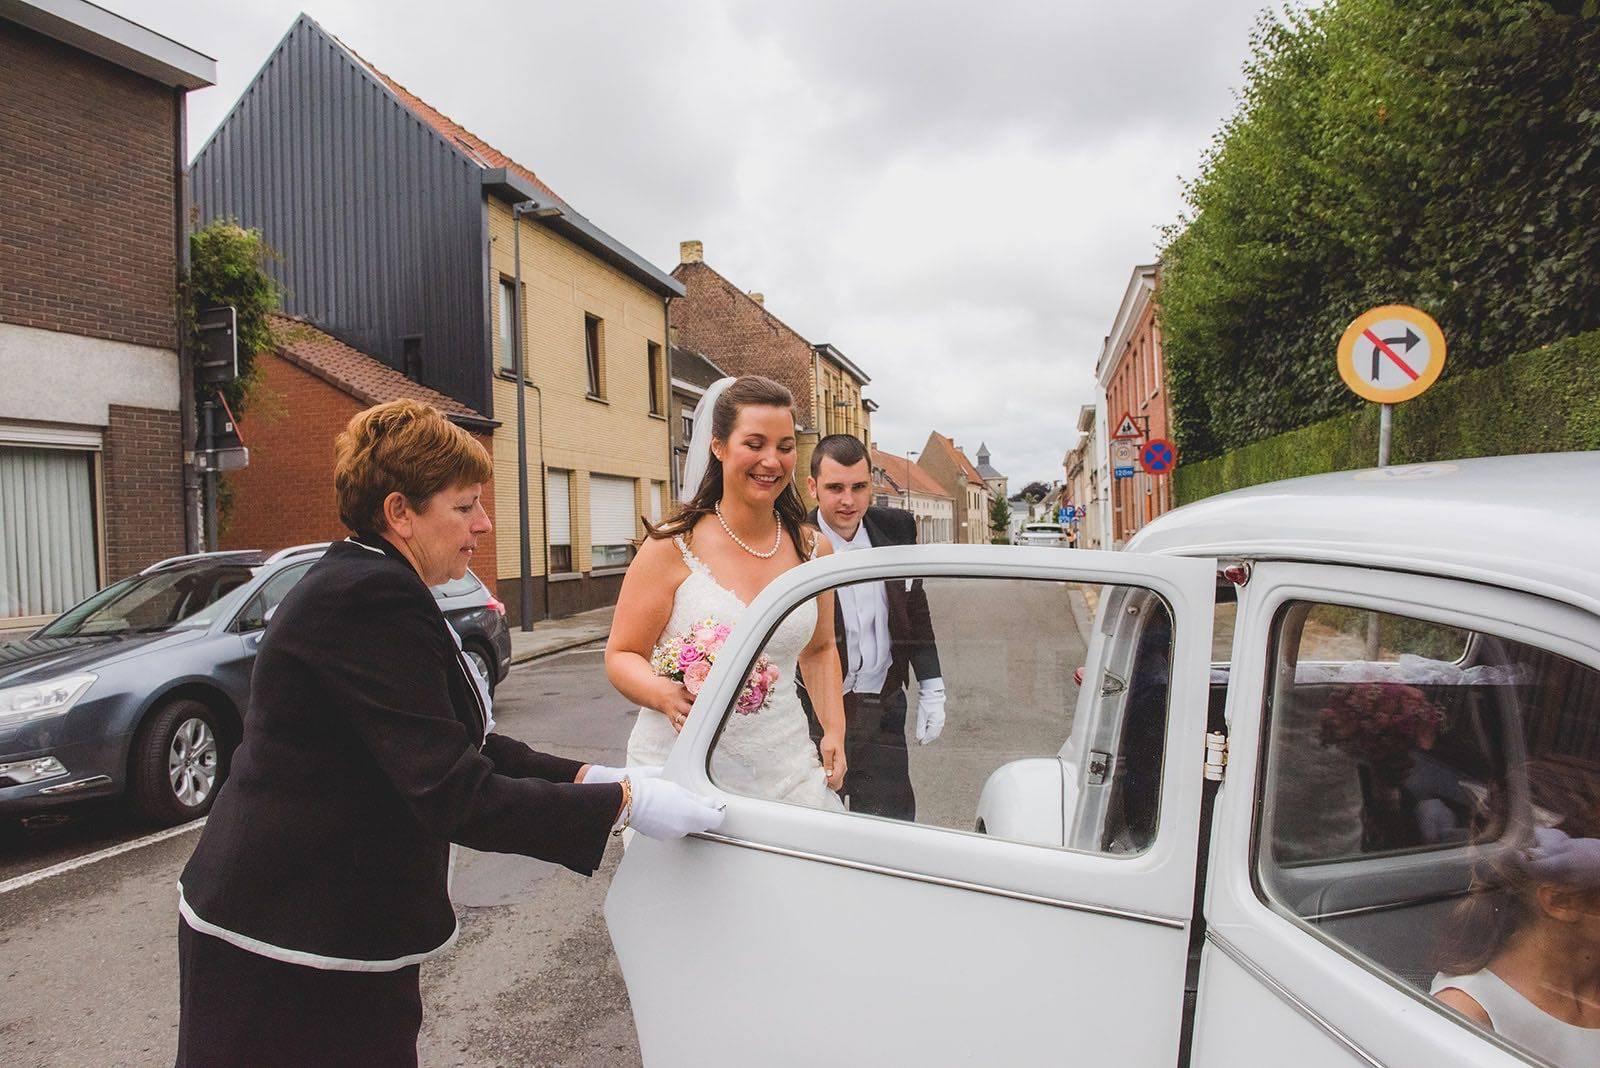 Lamont Ceremonie - Ceremonie - Fotograaf Upshot Photography - House of Weddings - 2